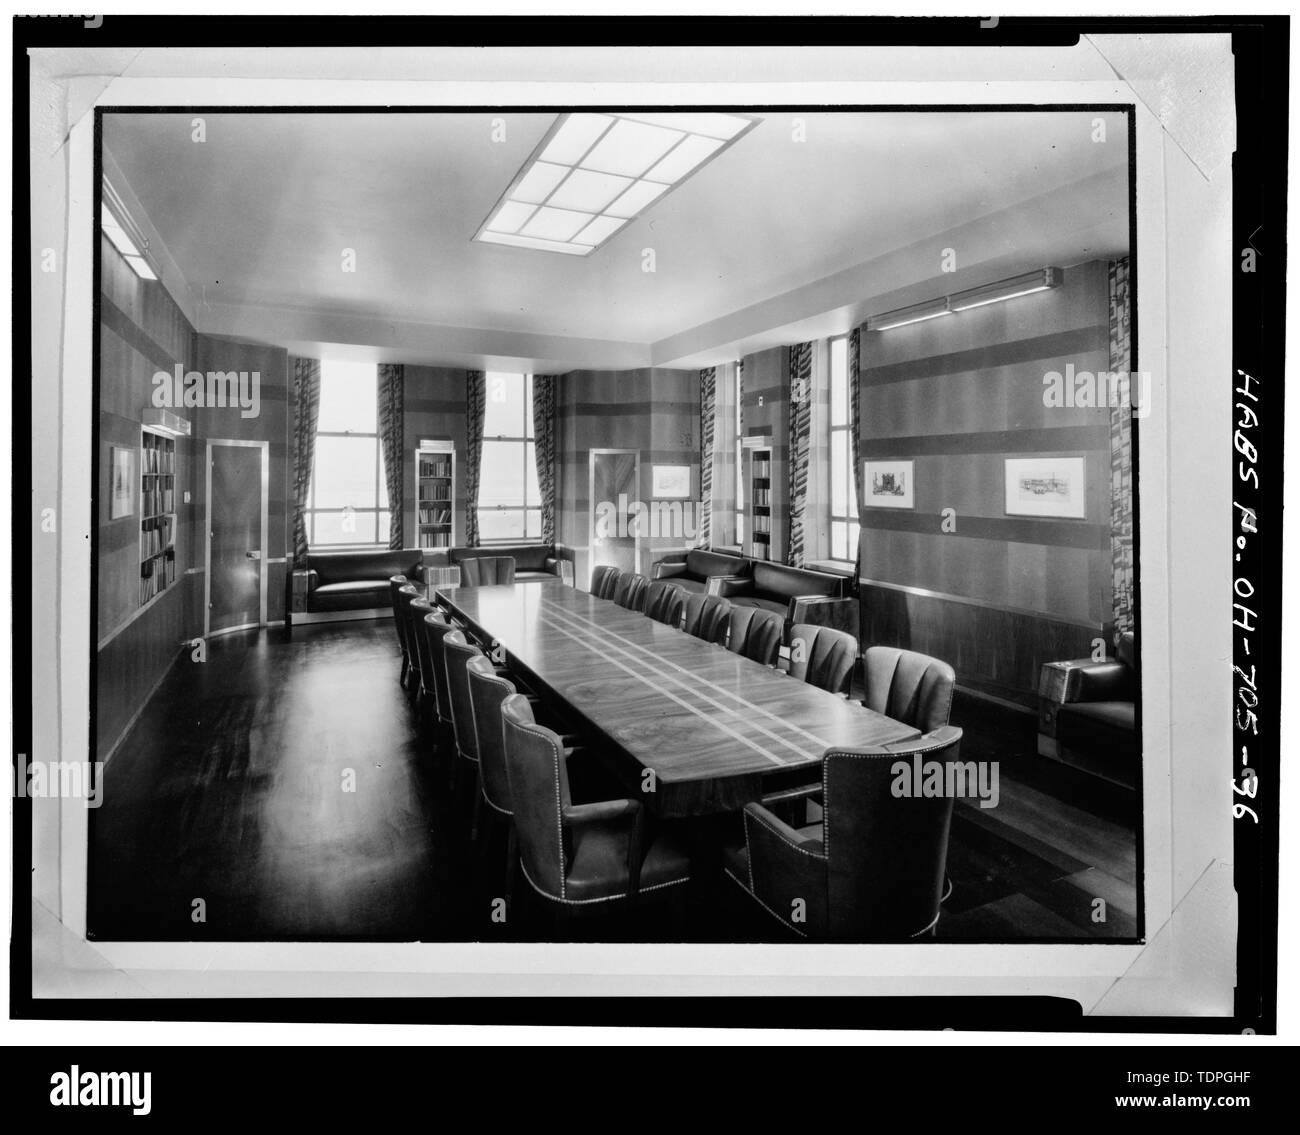 BOARD ROOM, LOOKING WEST - Cincinnati Union Terminal, 1301 Western Avenue, Cincinnati, Hamilton County, OH - Stock Image